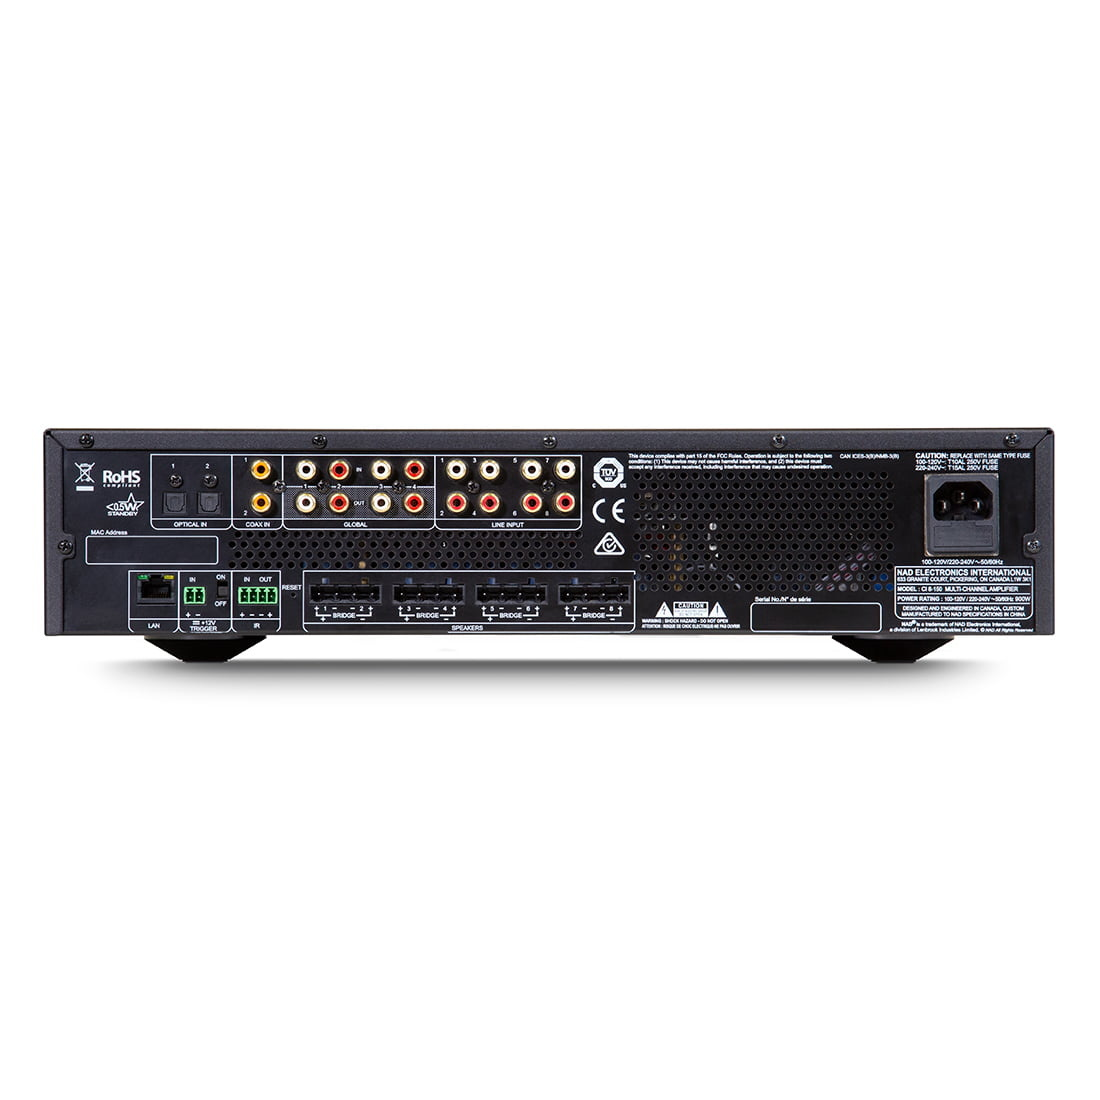 NAD CI 8-150 DSP Distribution Amplifier